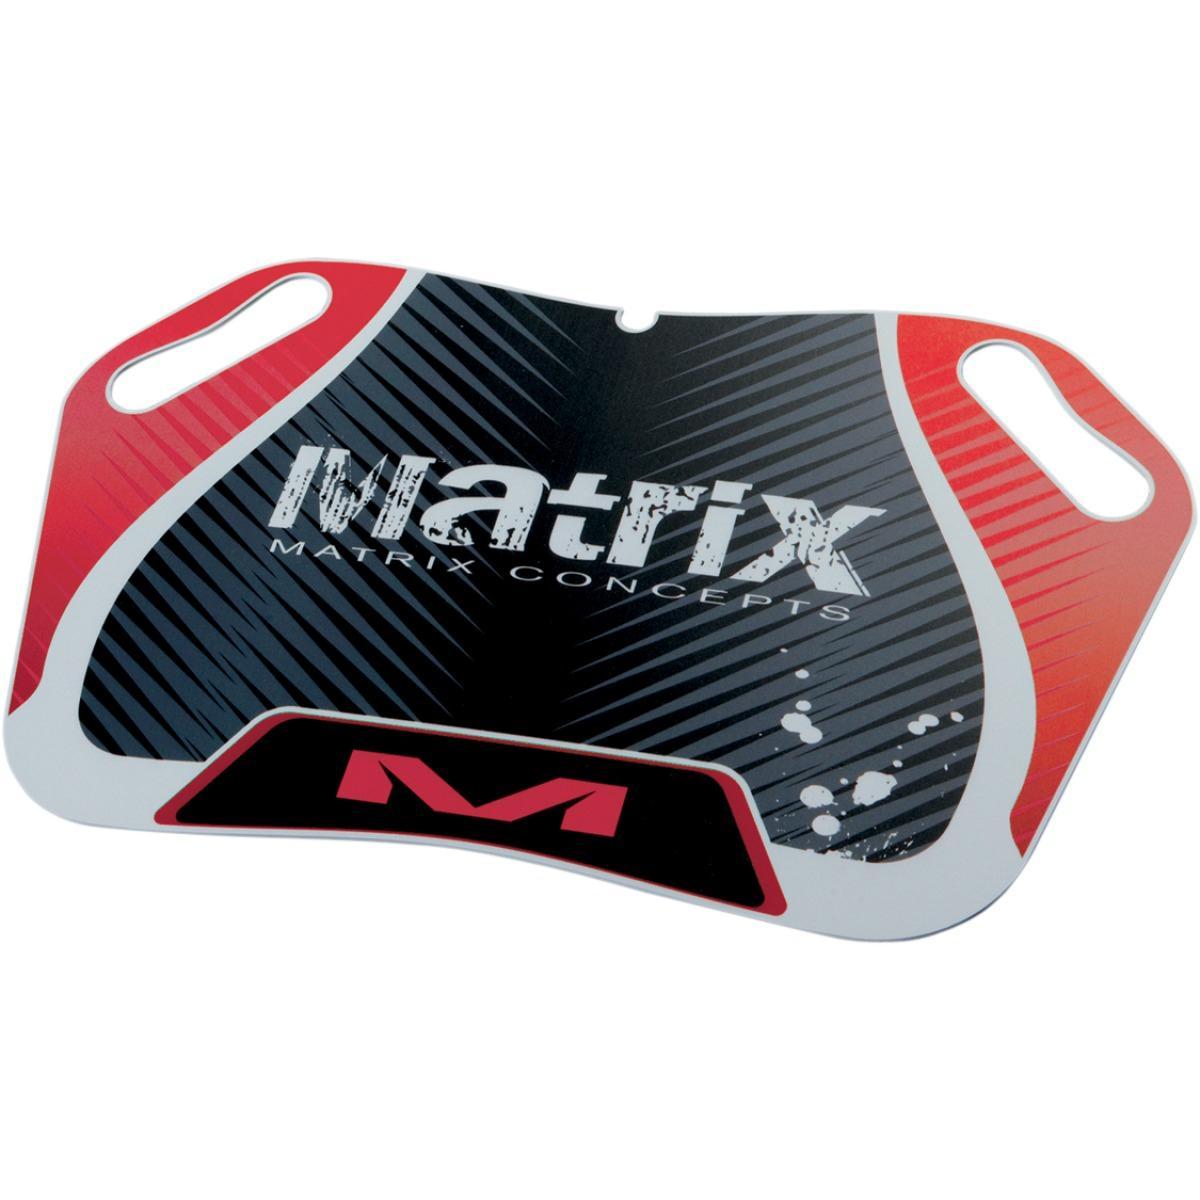 Matrix Concepts M25 Pit Board